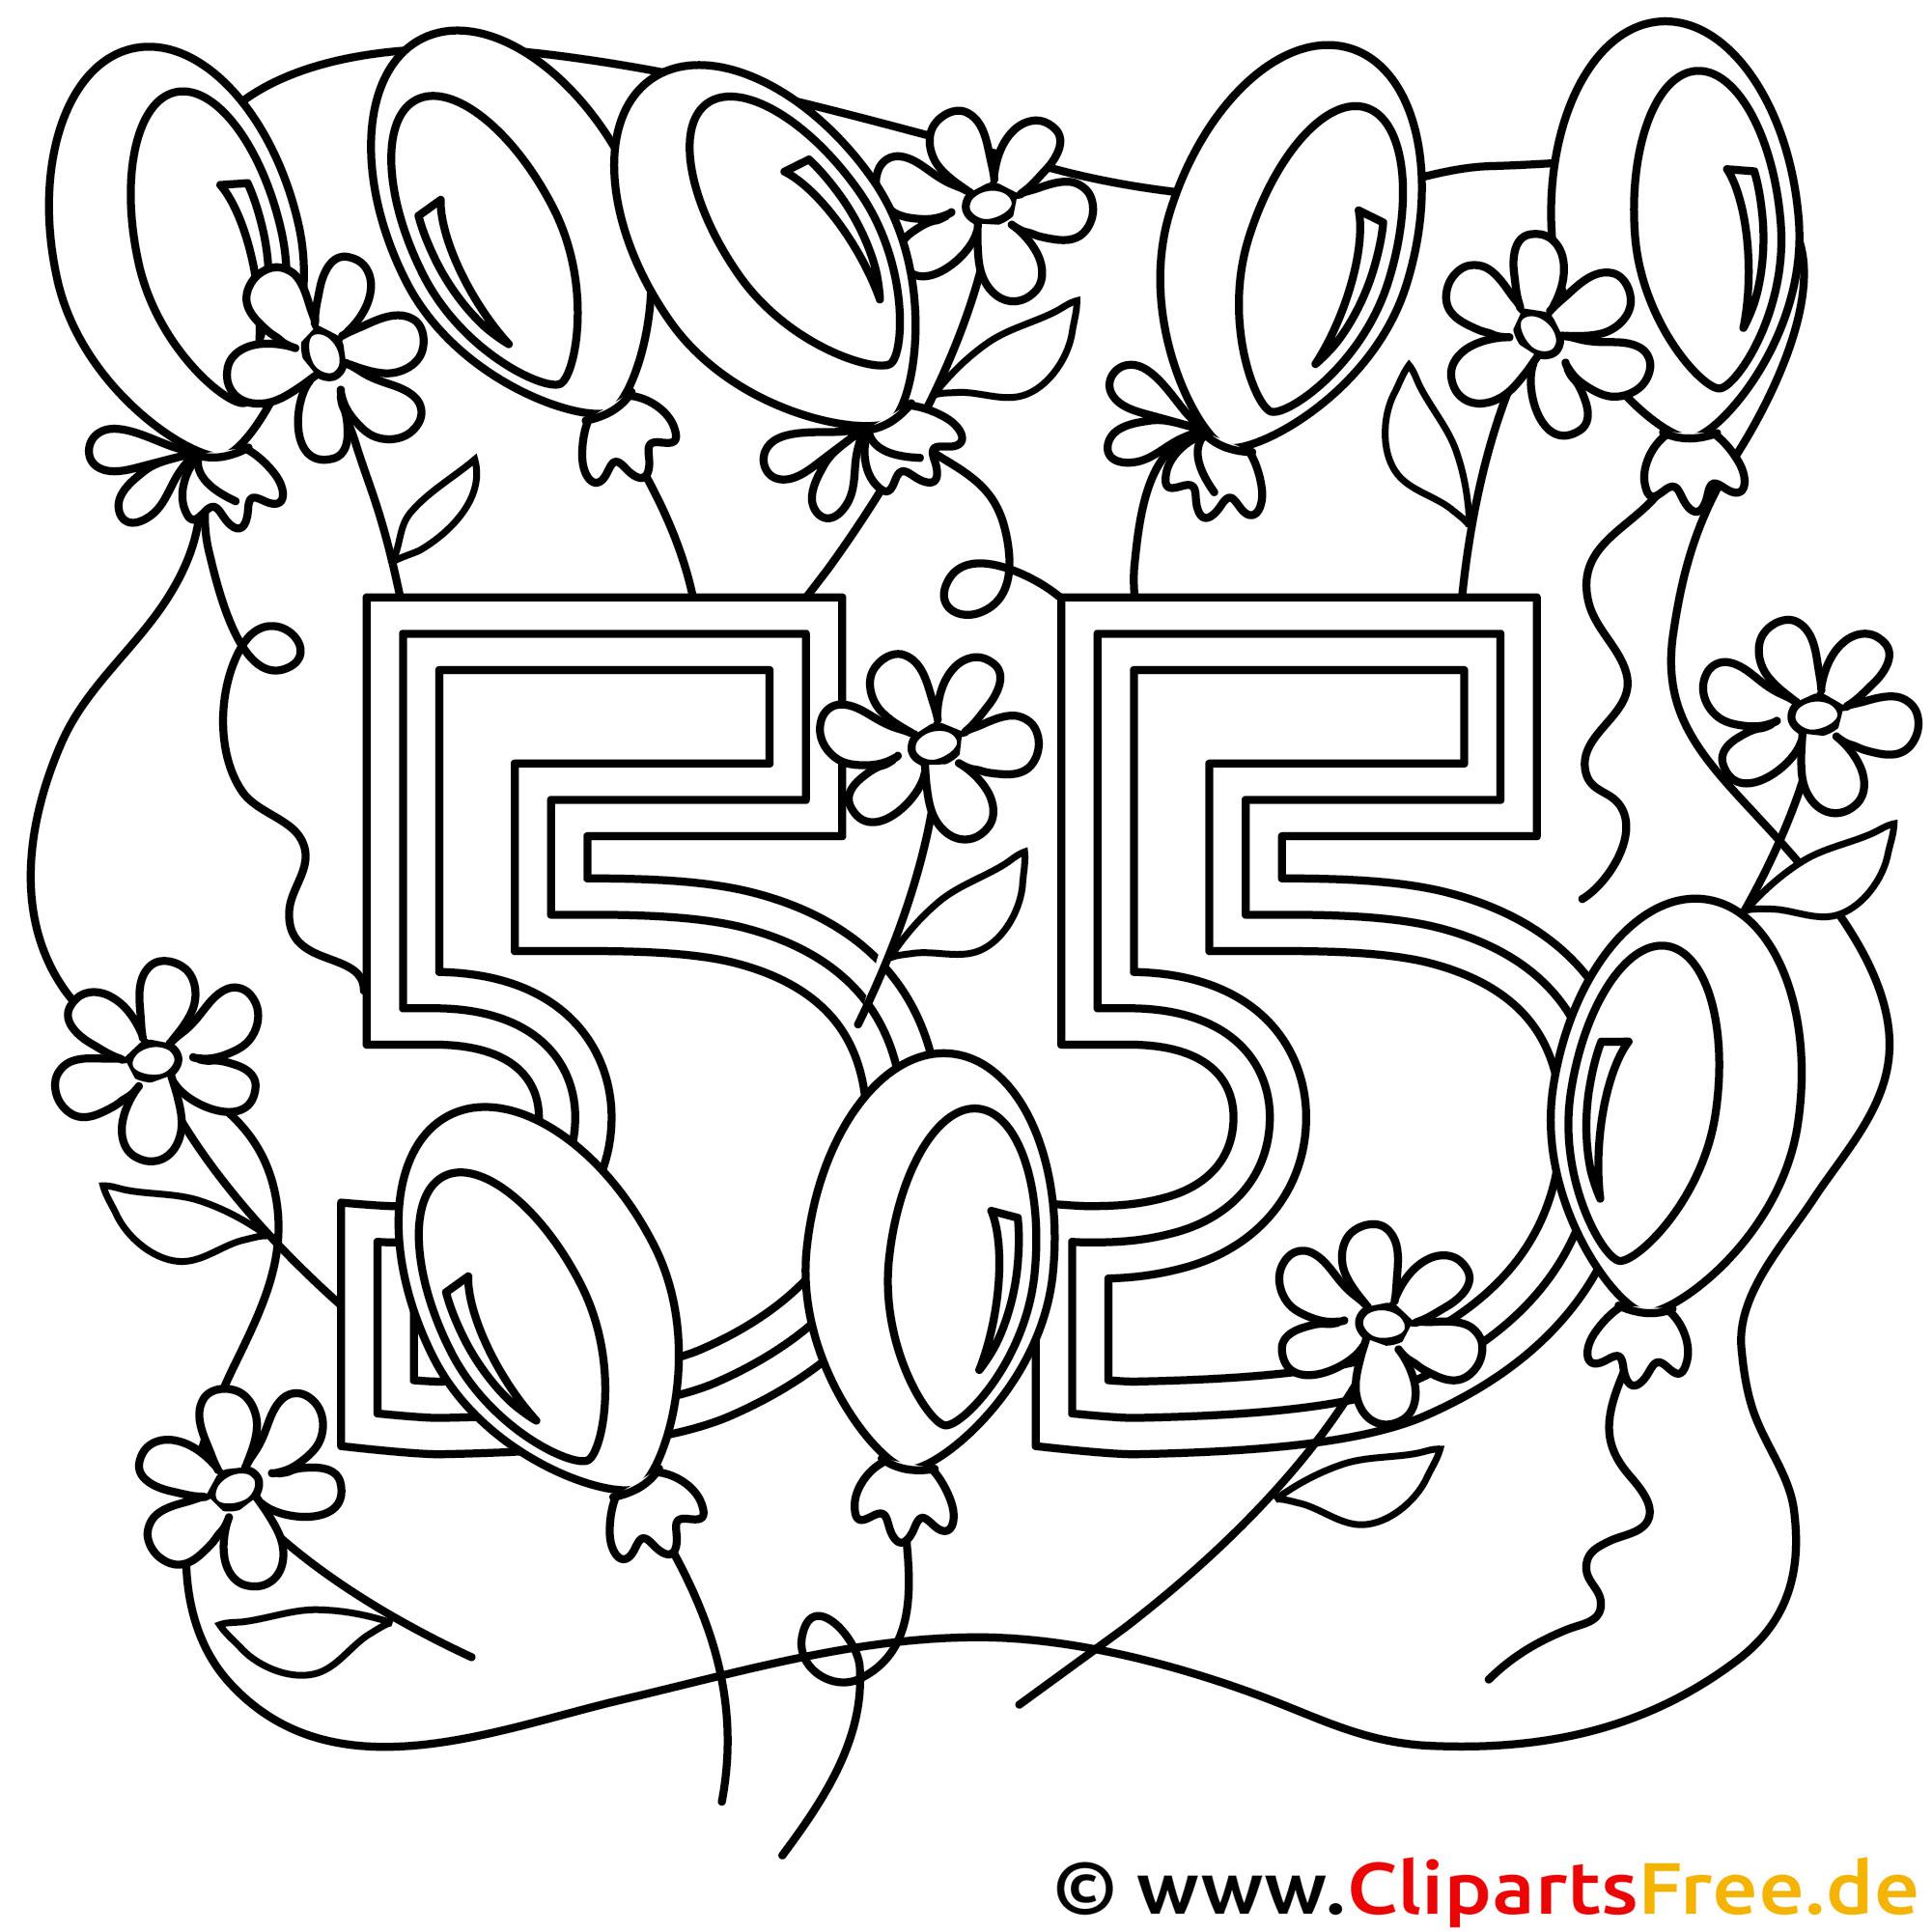 Ausmalbild zum 55 Geburtstag